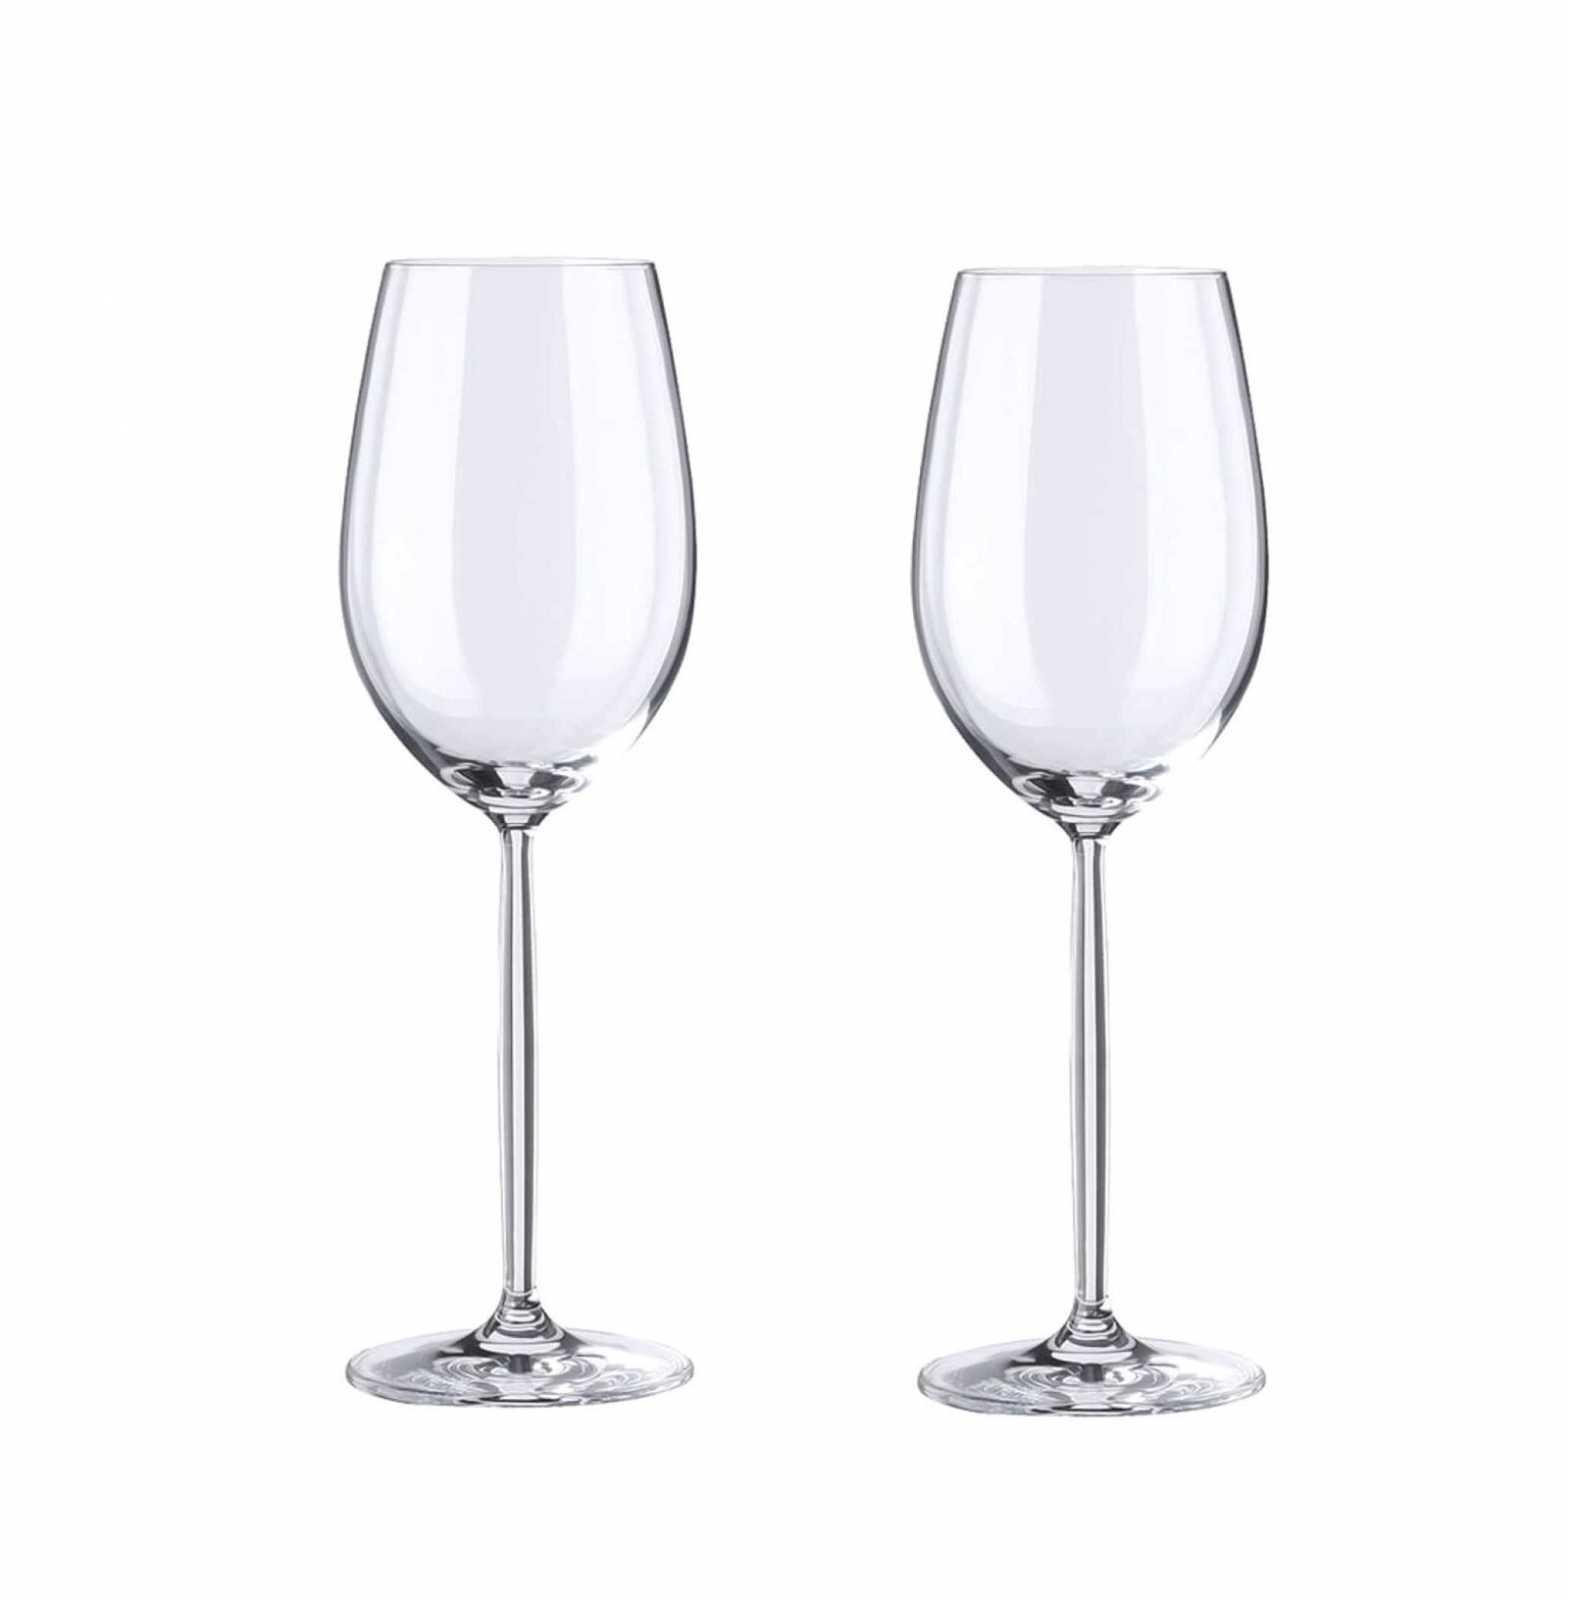 Онлайн каталог PROMENU: Набор бокалов для белого вина Schott Zwiesel DIVA PROMO, объем 0,302 л, прозрачный, 2 штуки                               121203